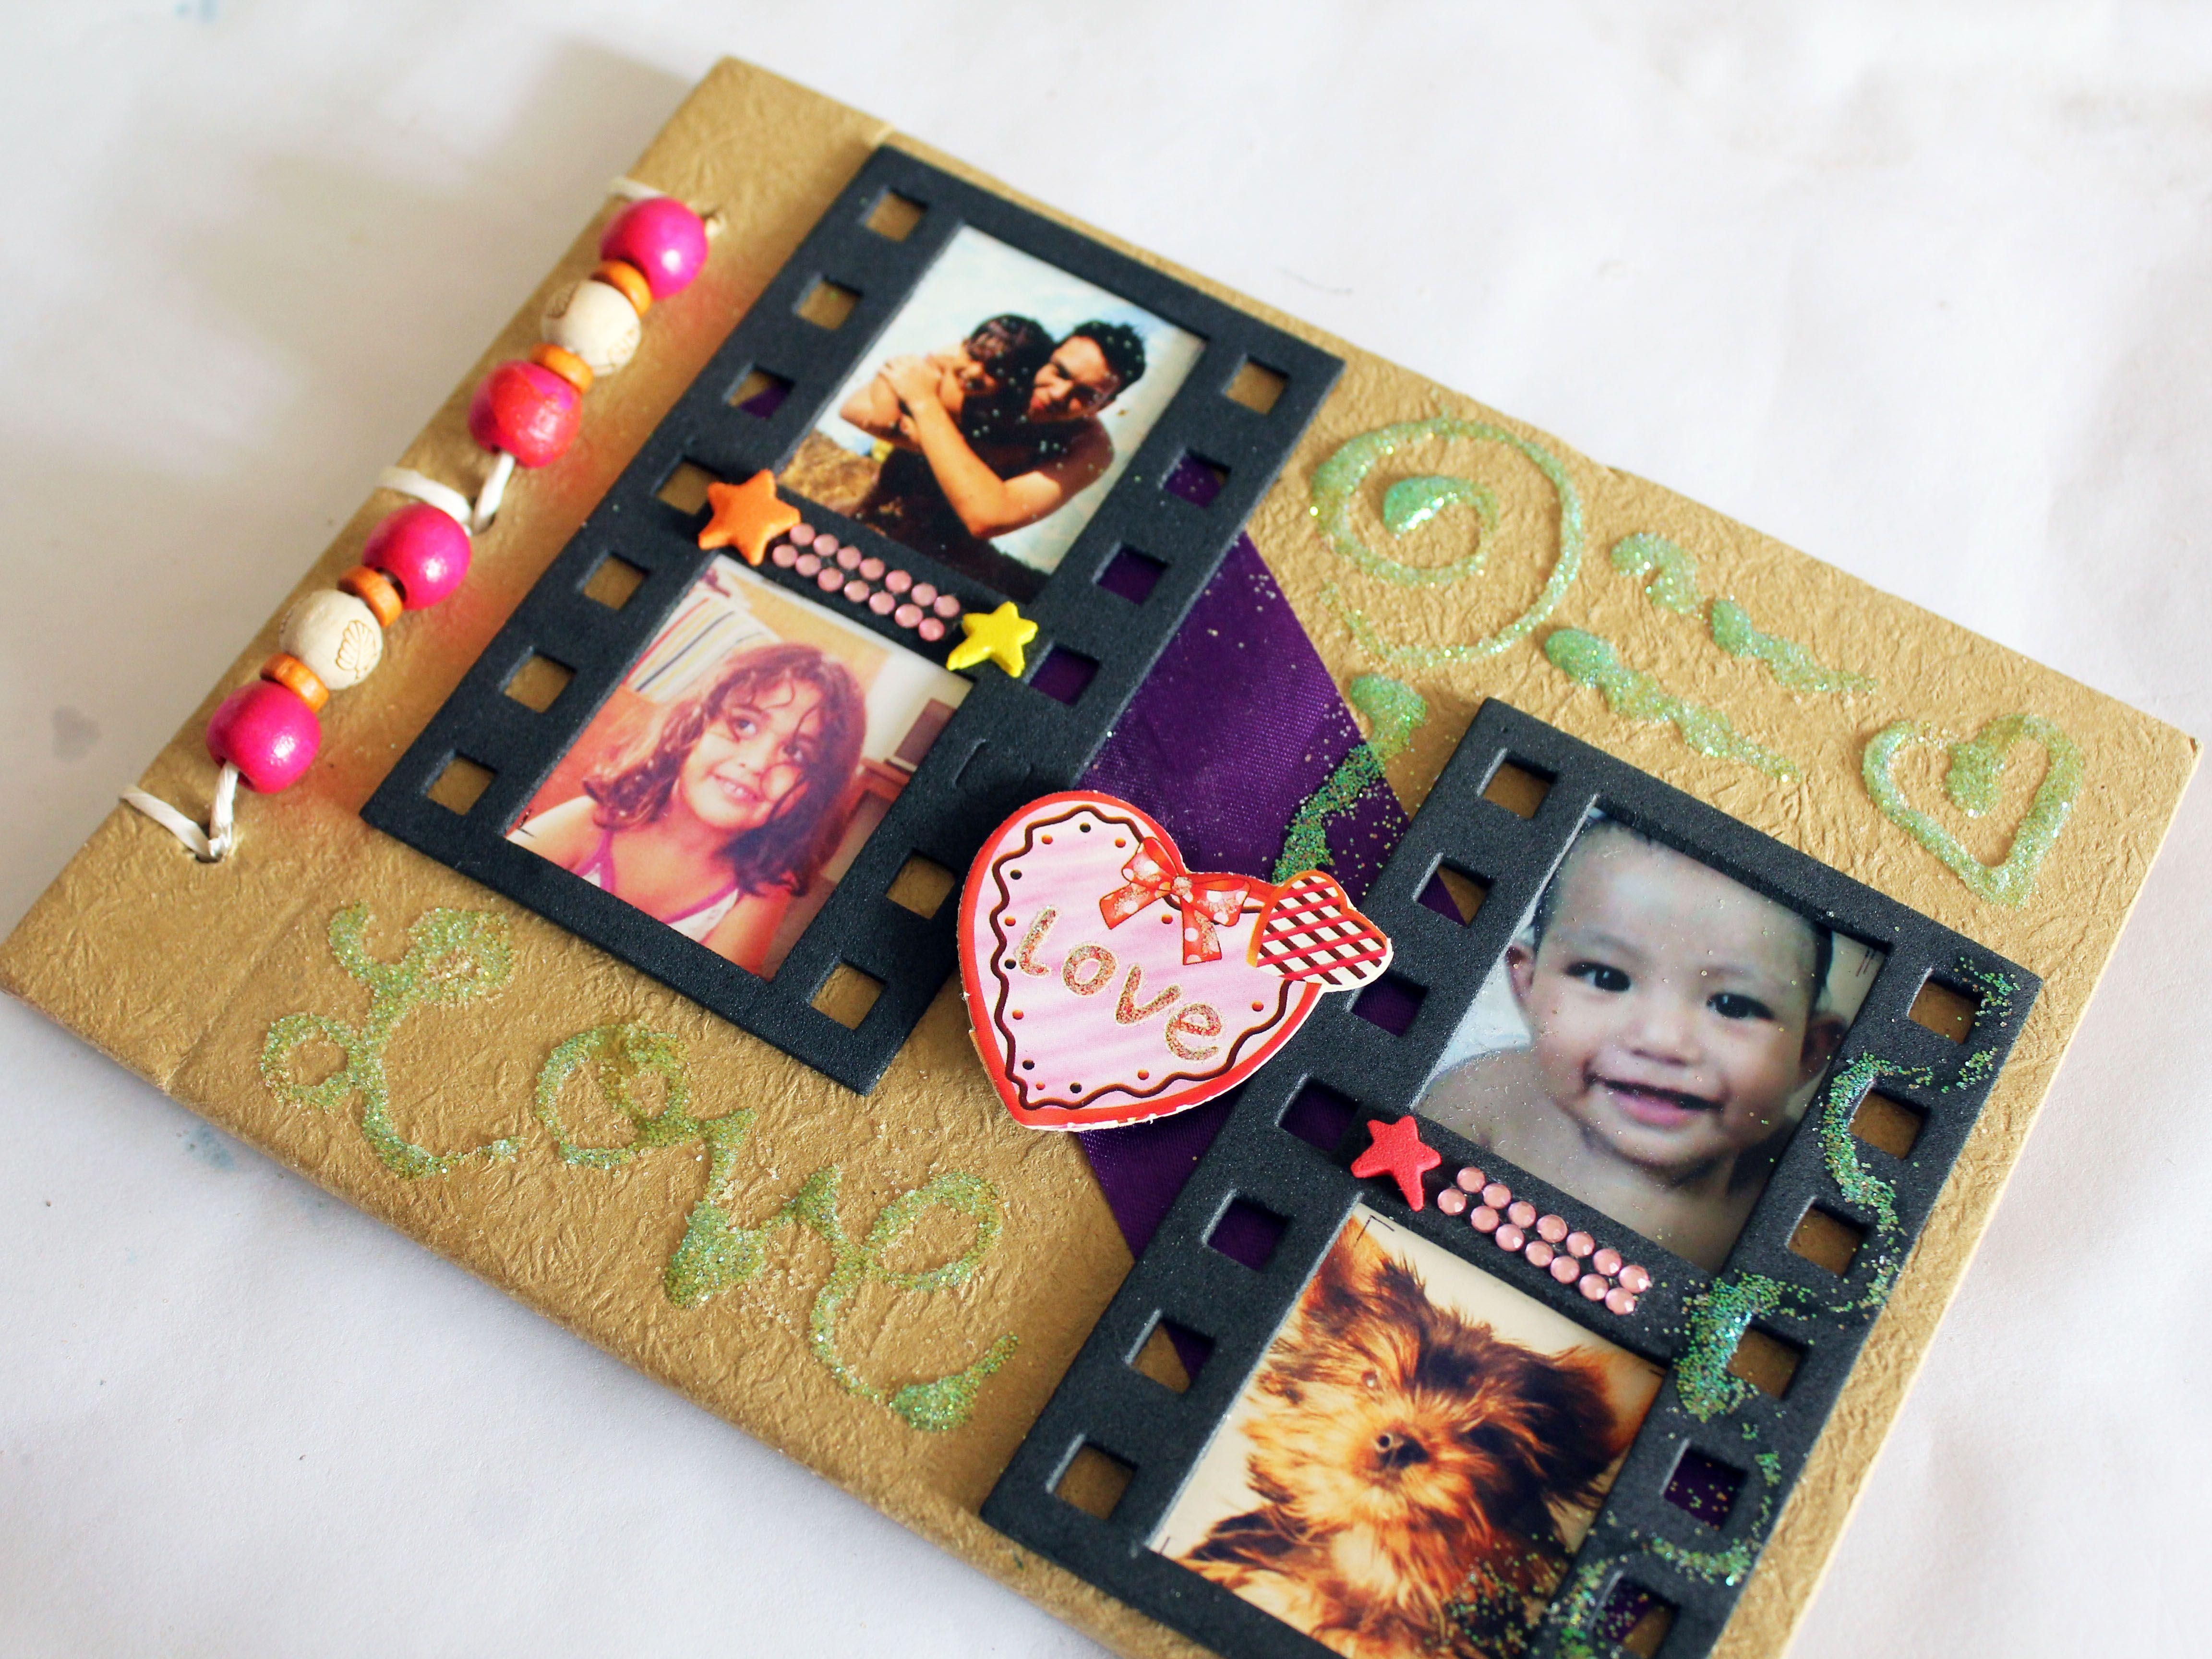 How to make a homemade scrapbook with construction paper make a best friends scrapbook